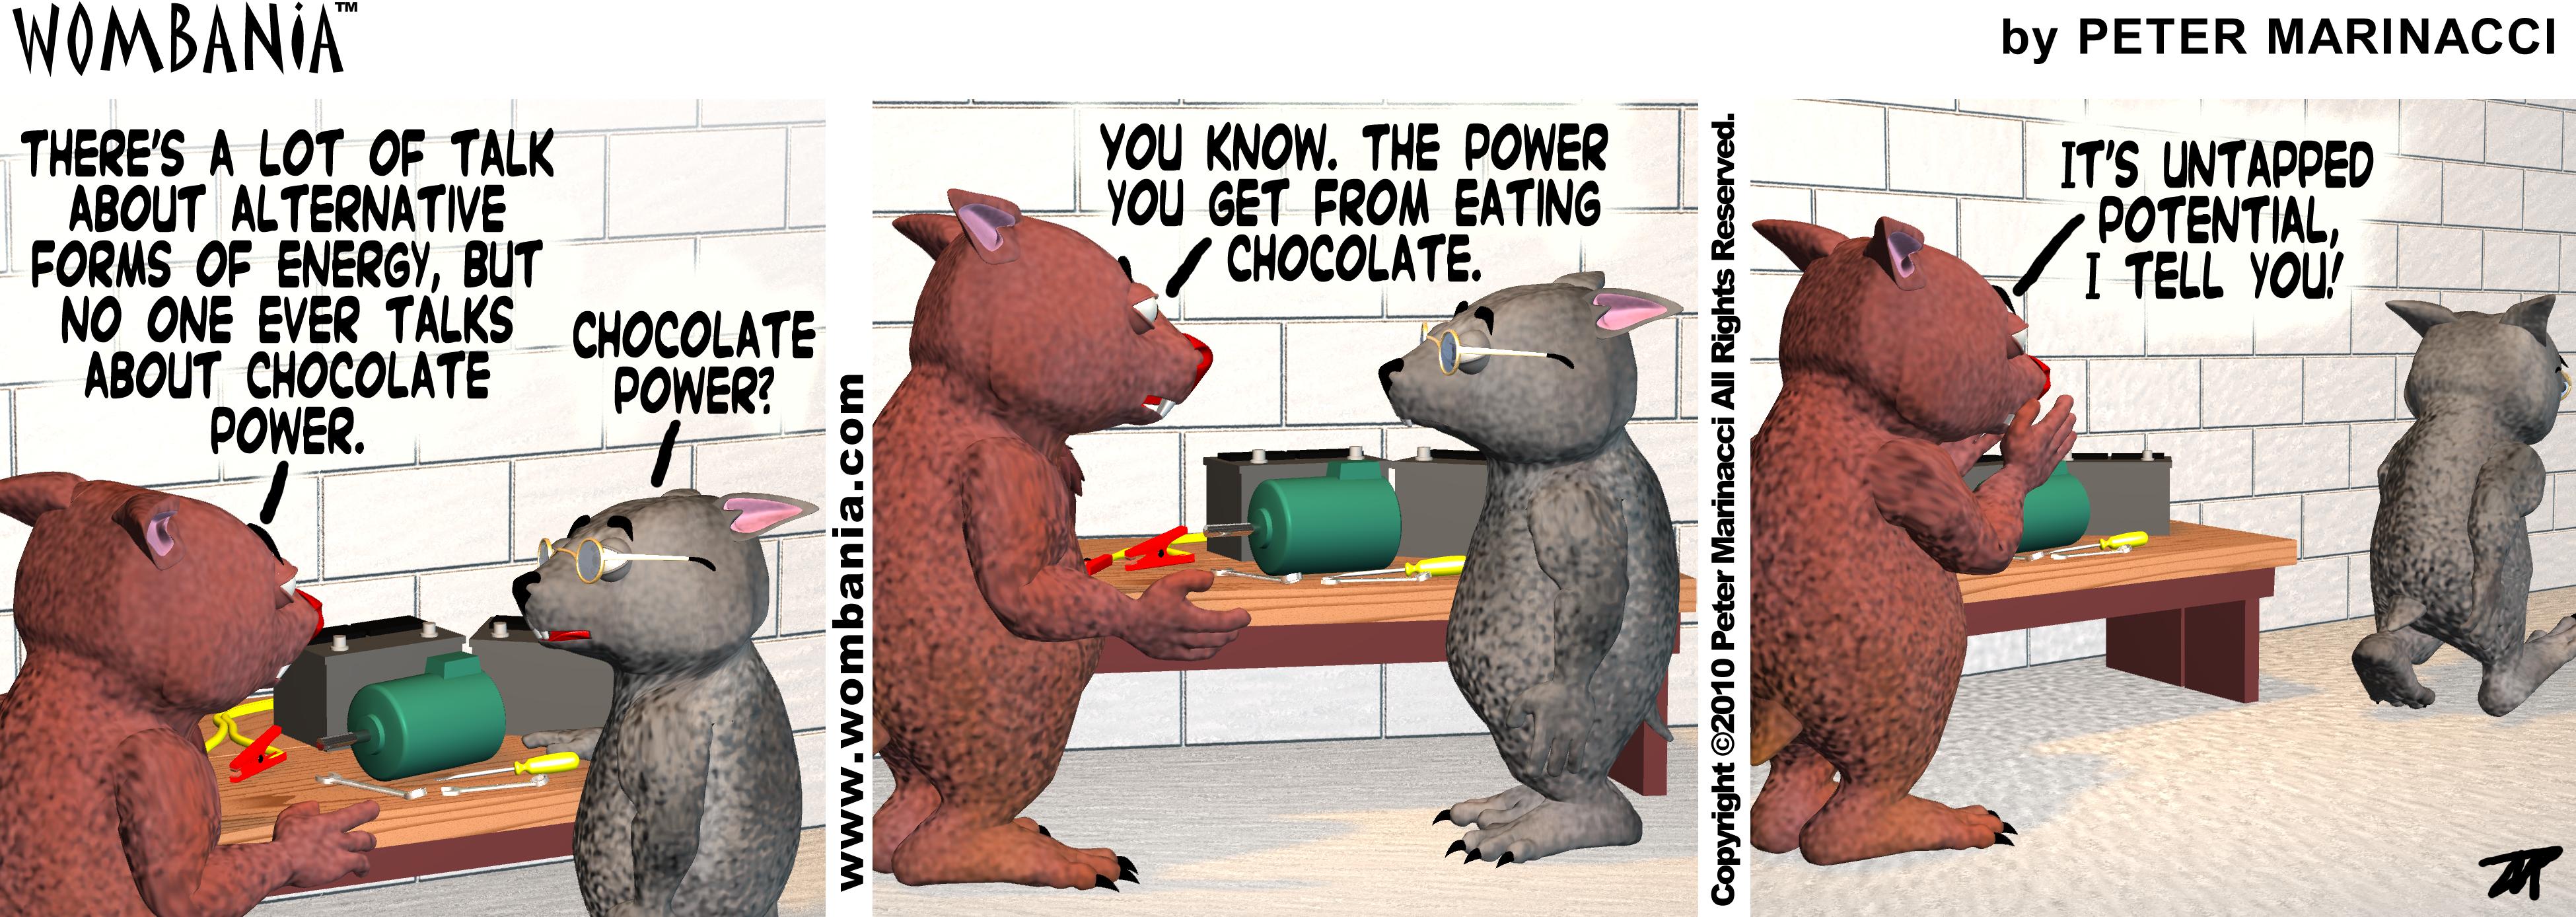 Chocolate Power